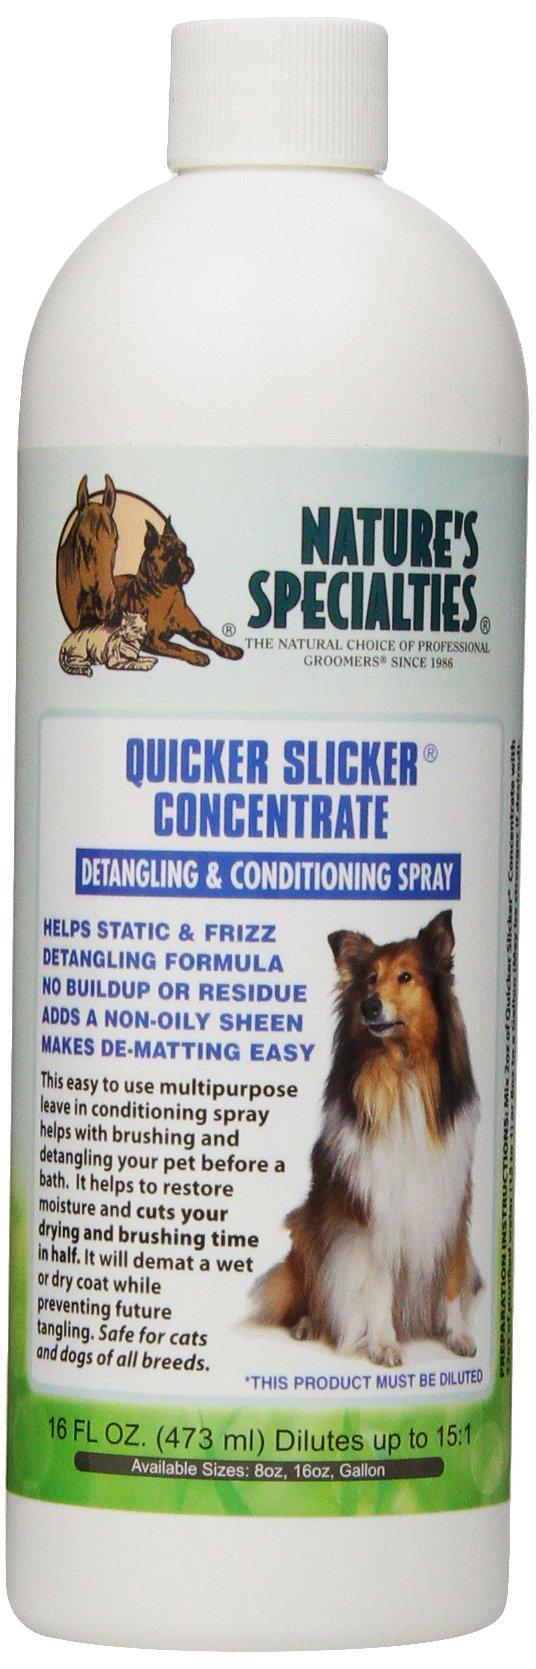 Nature's Specialties Quicker Slicker Concentrate Pet Conditioner, 16-Ounce